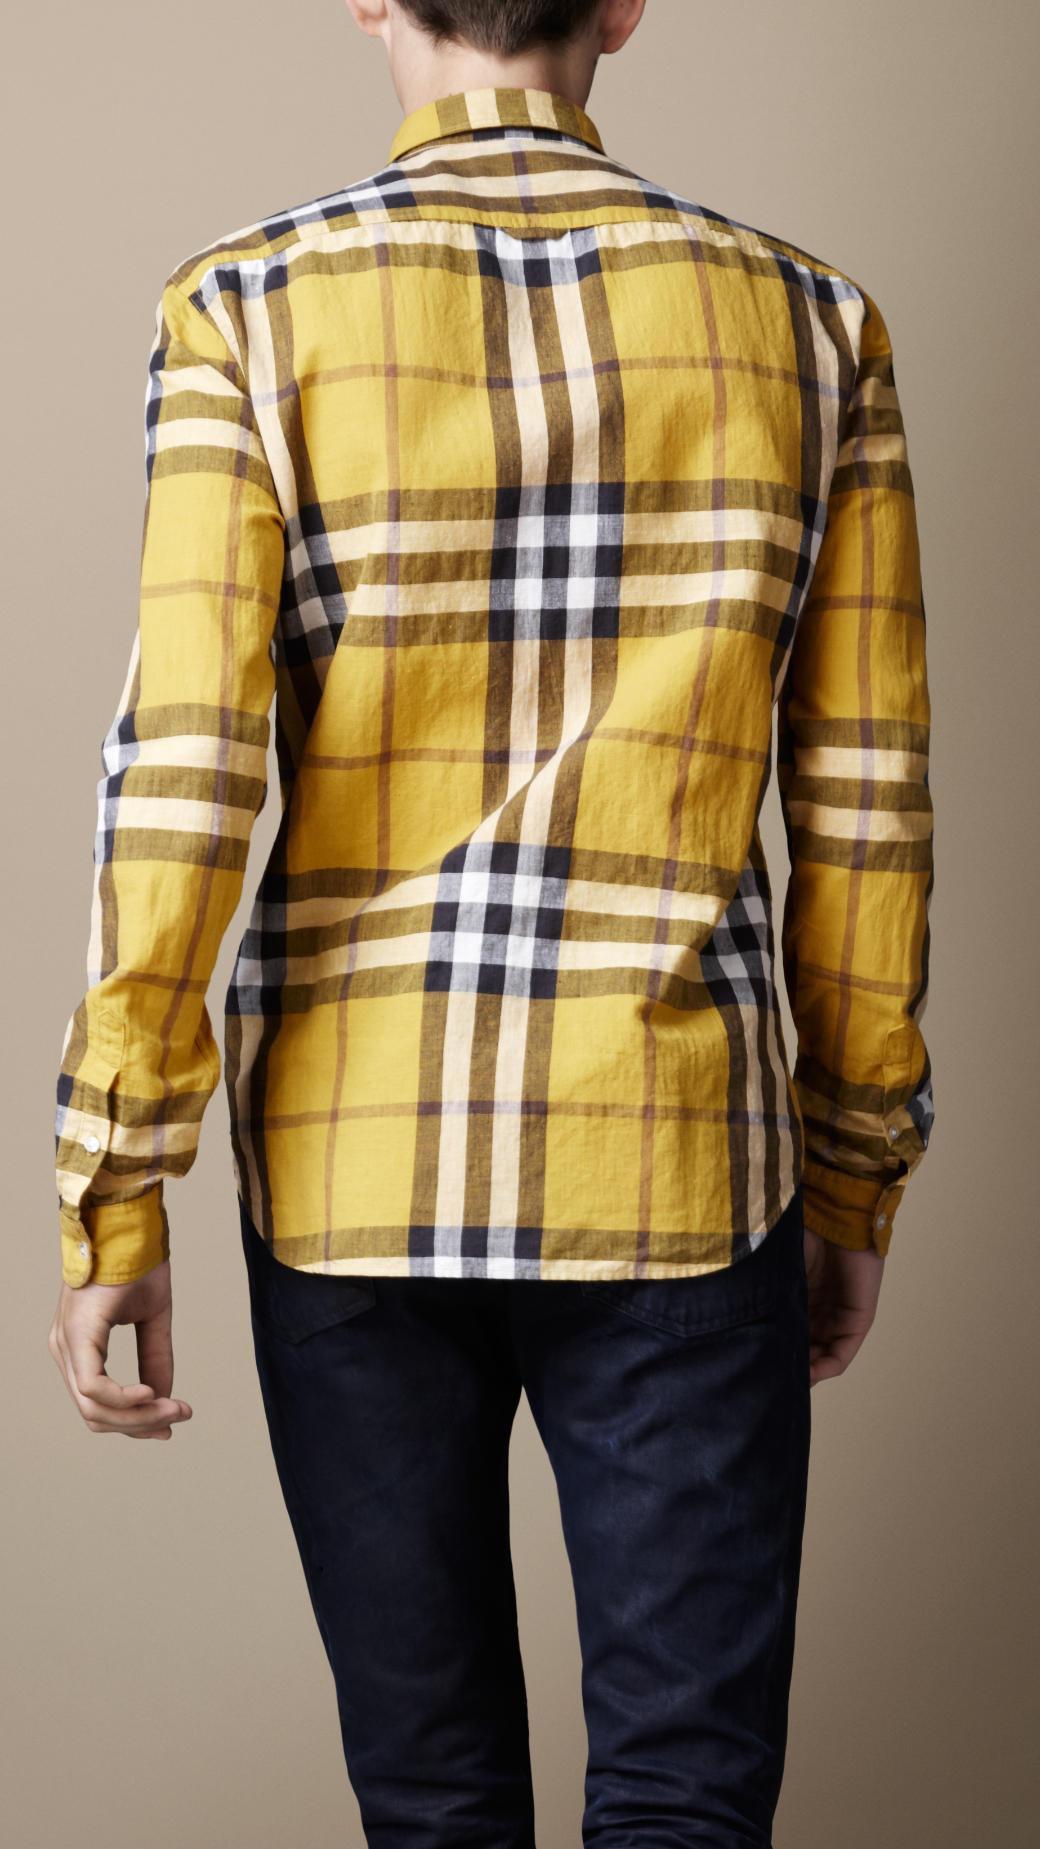 Lyst - Burberry Brit Check Cotton Linen Shirt in Yellow for Men d1ce642fff